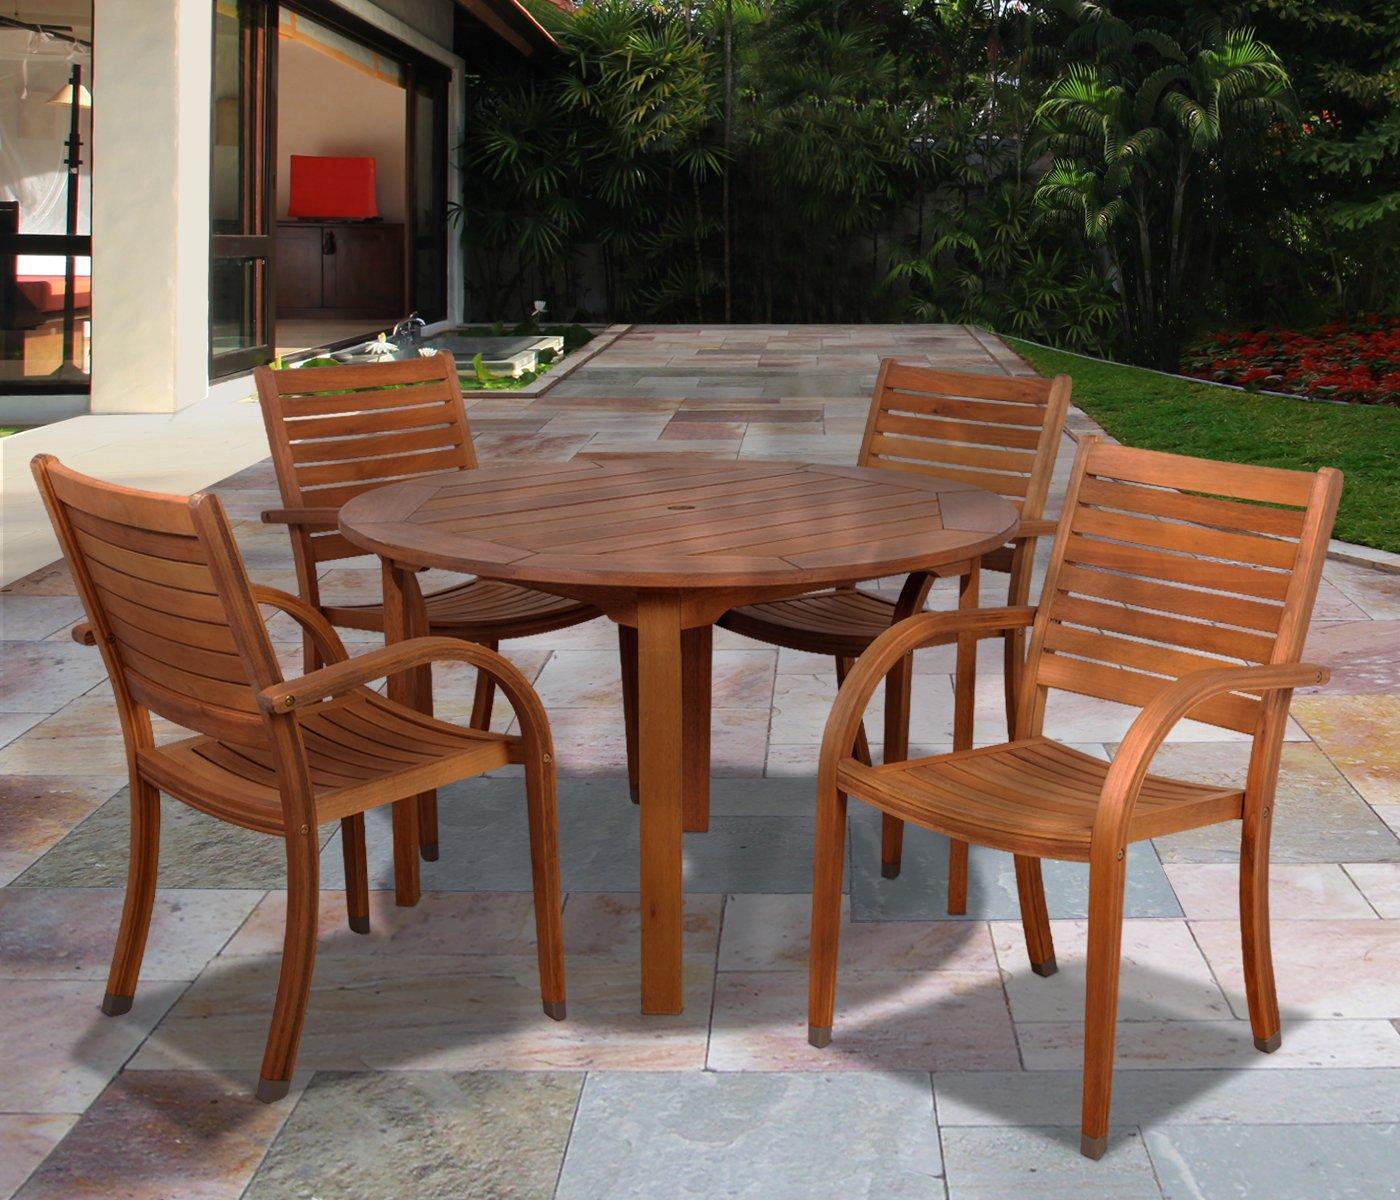 Amazon.com : Amazonia Arizona 5 Piece Eucalyptus Round Dining Set : Outdoor  And Patio Furniture Sets : Garden U0026 Outdoor